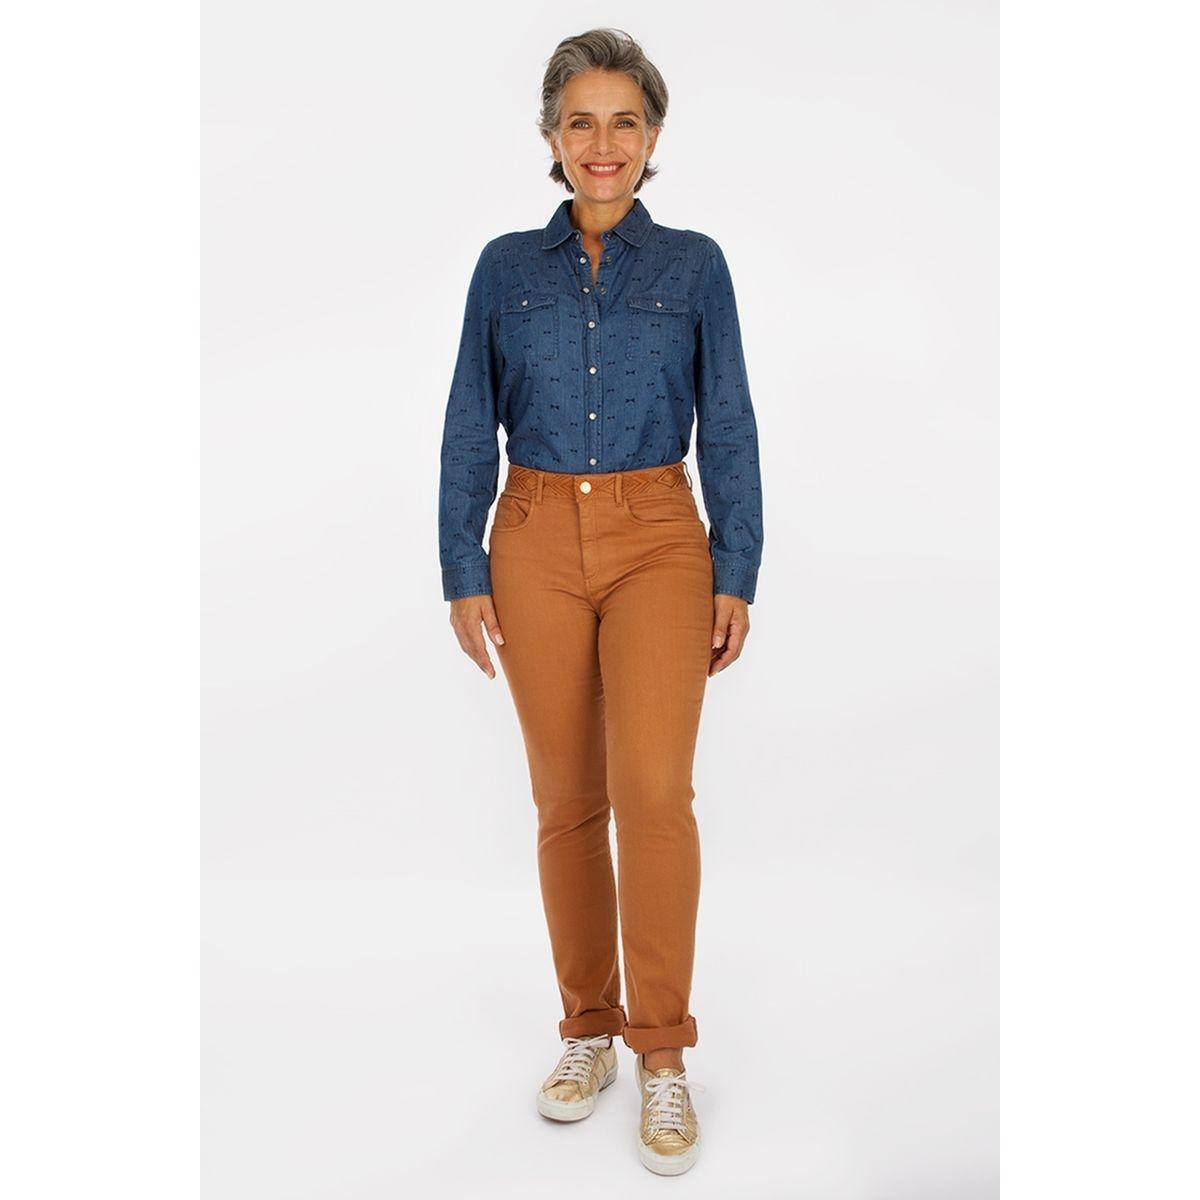 Pantalon ceinture brodée